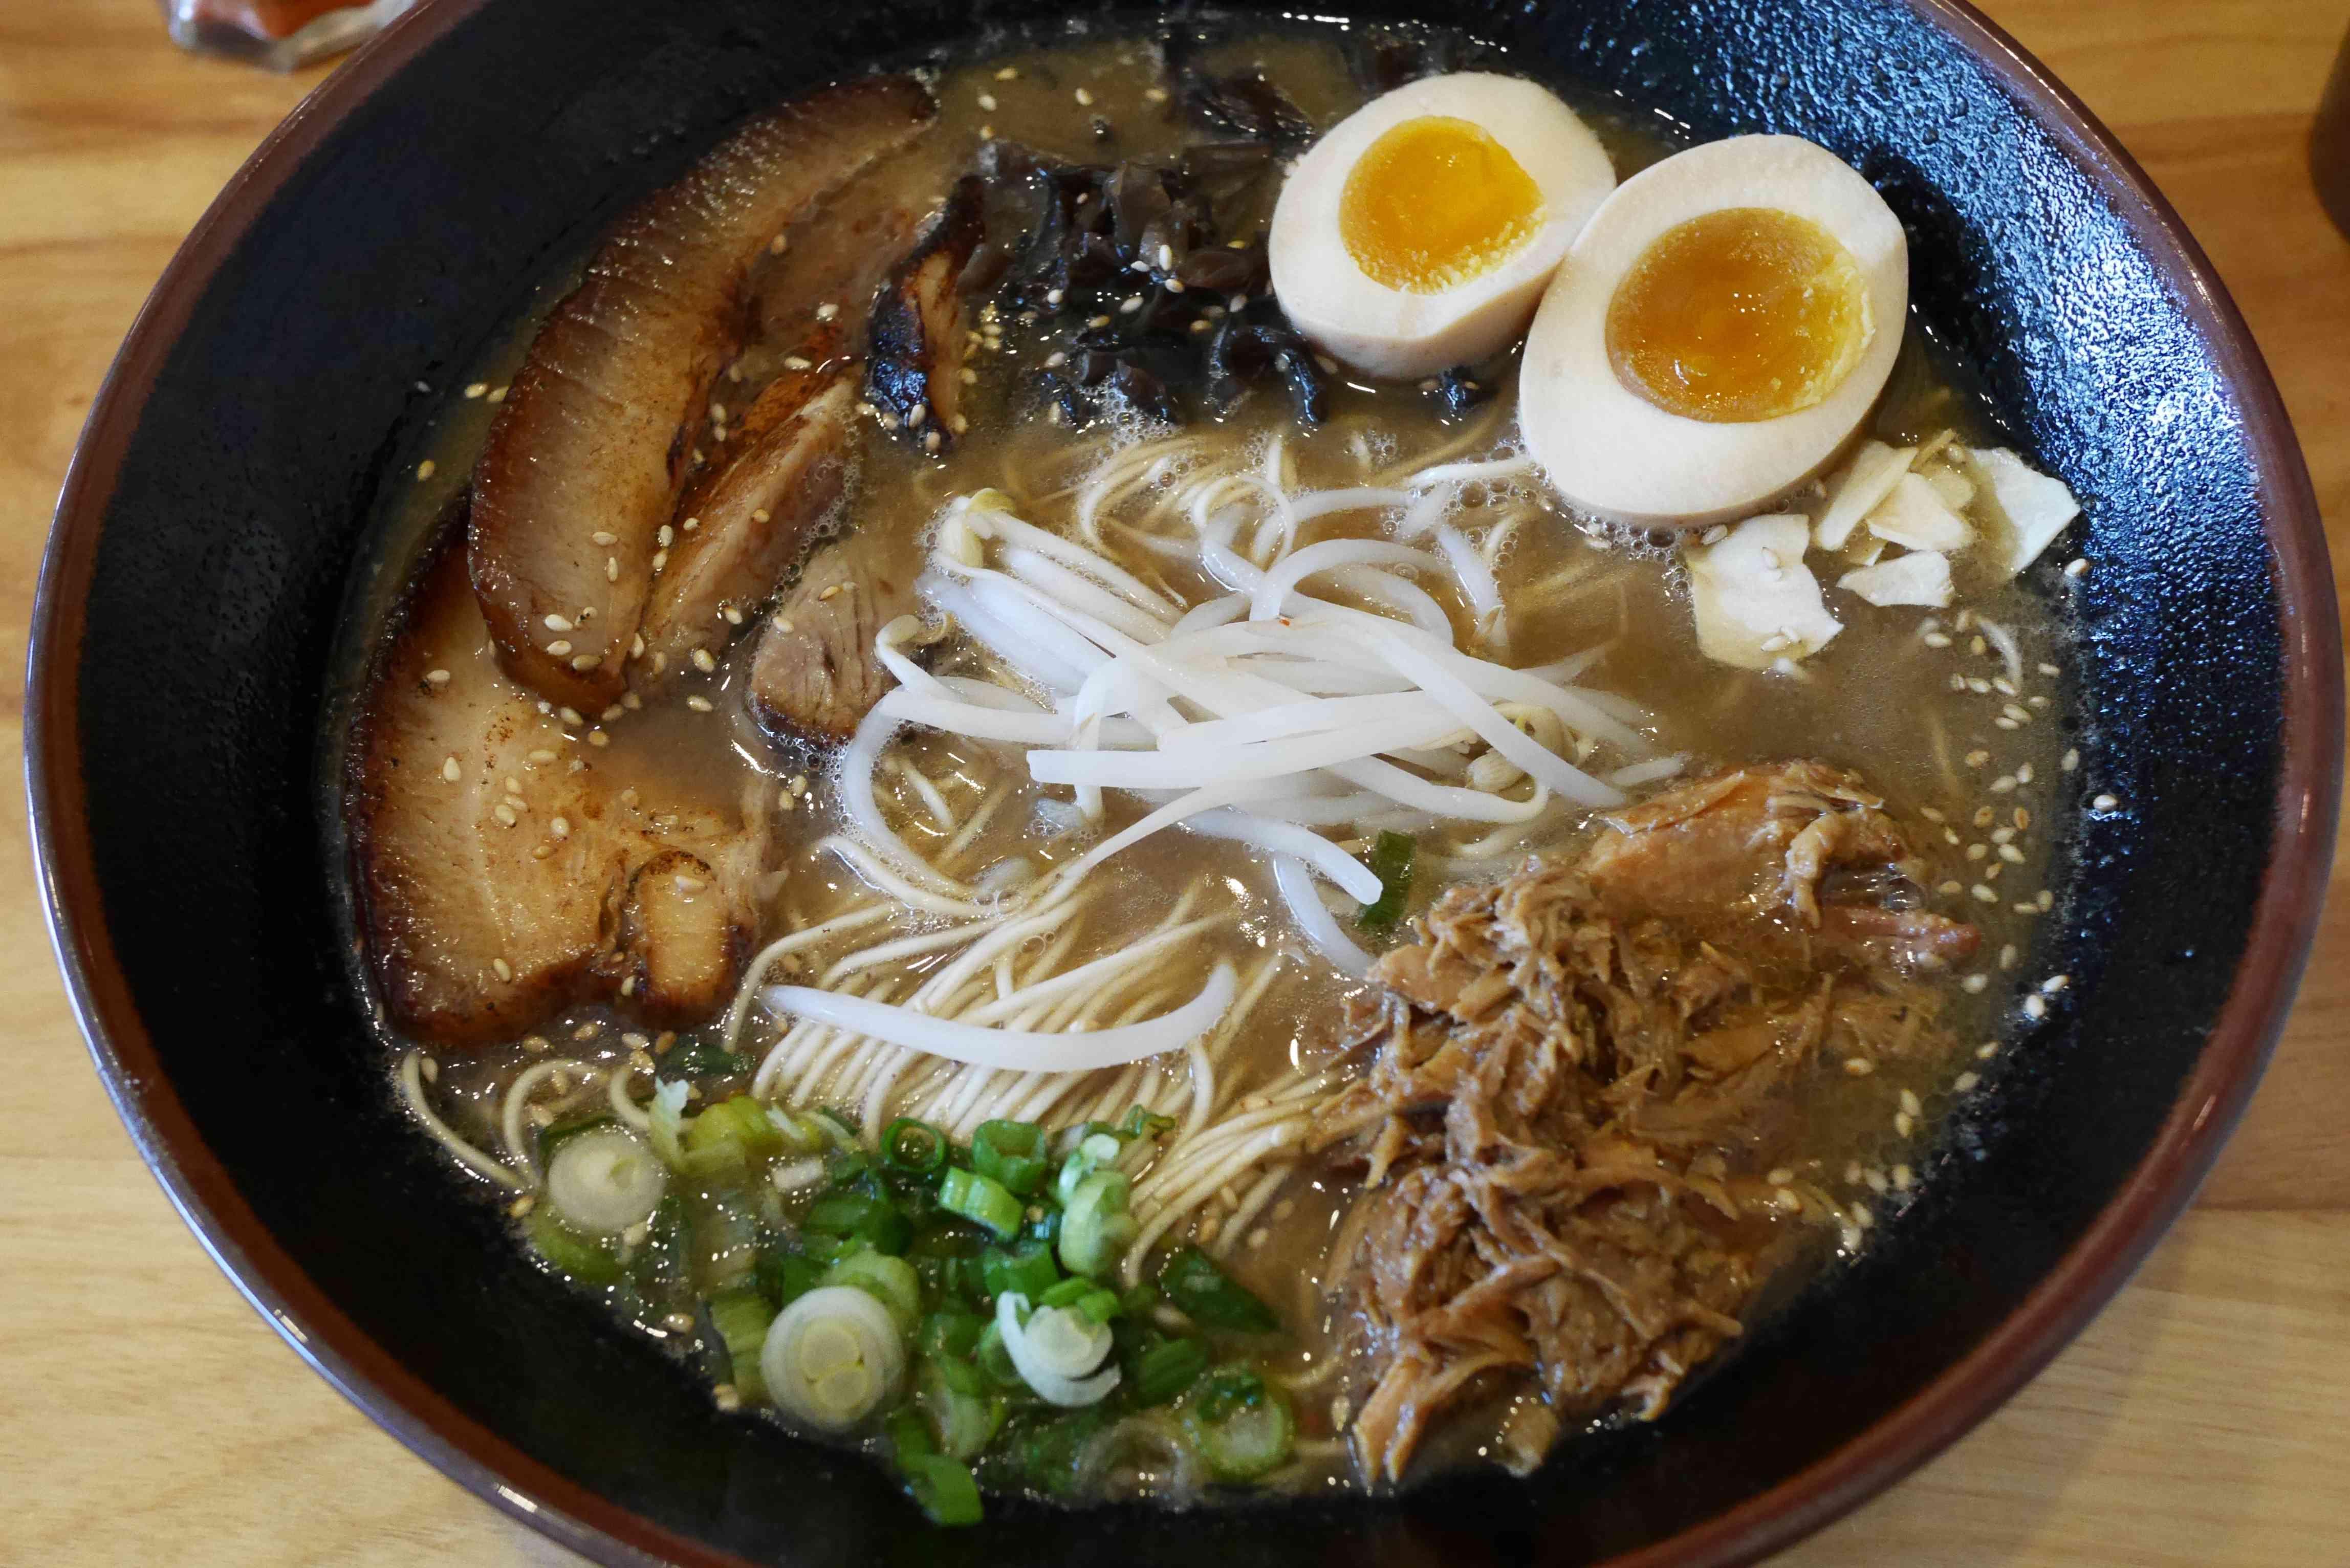 Mr. Taka ramen with pork belly, shredded pork, tofu, scallions and a split, boiled egg